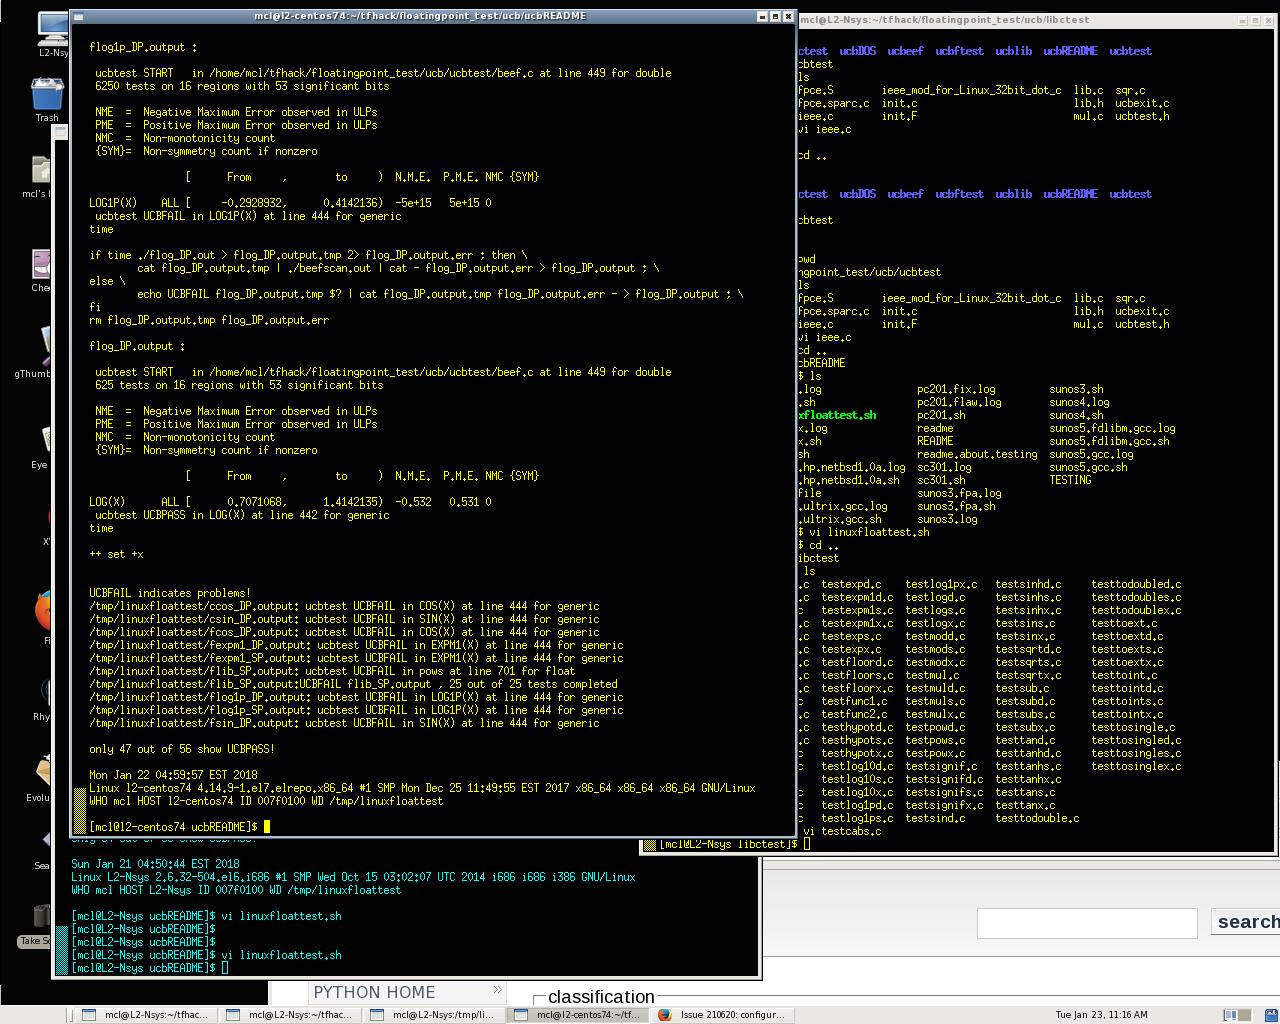 Tensorflow 1 4 1 on Linux (CentOS-7 4) and Tensorflow 1 4 1